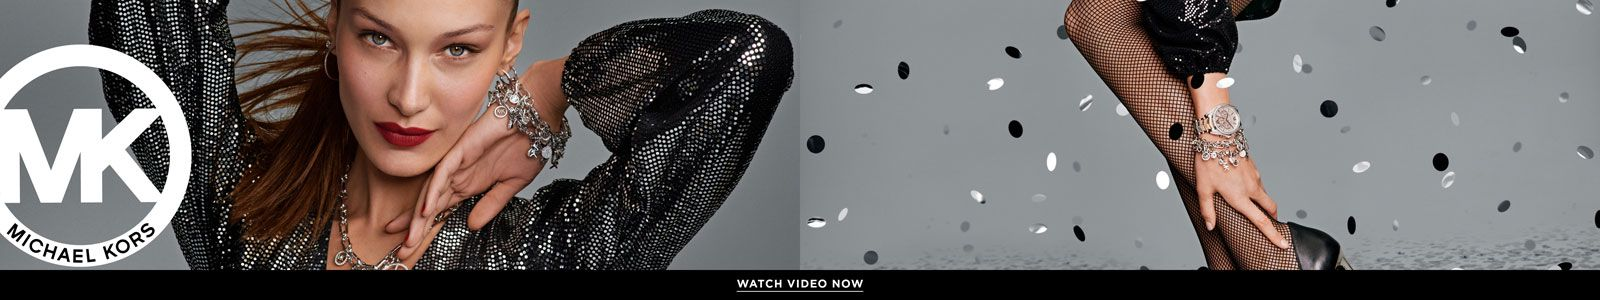 Michael Kors, Watch Video Now